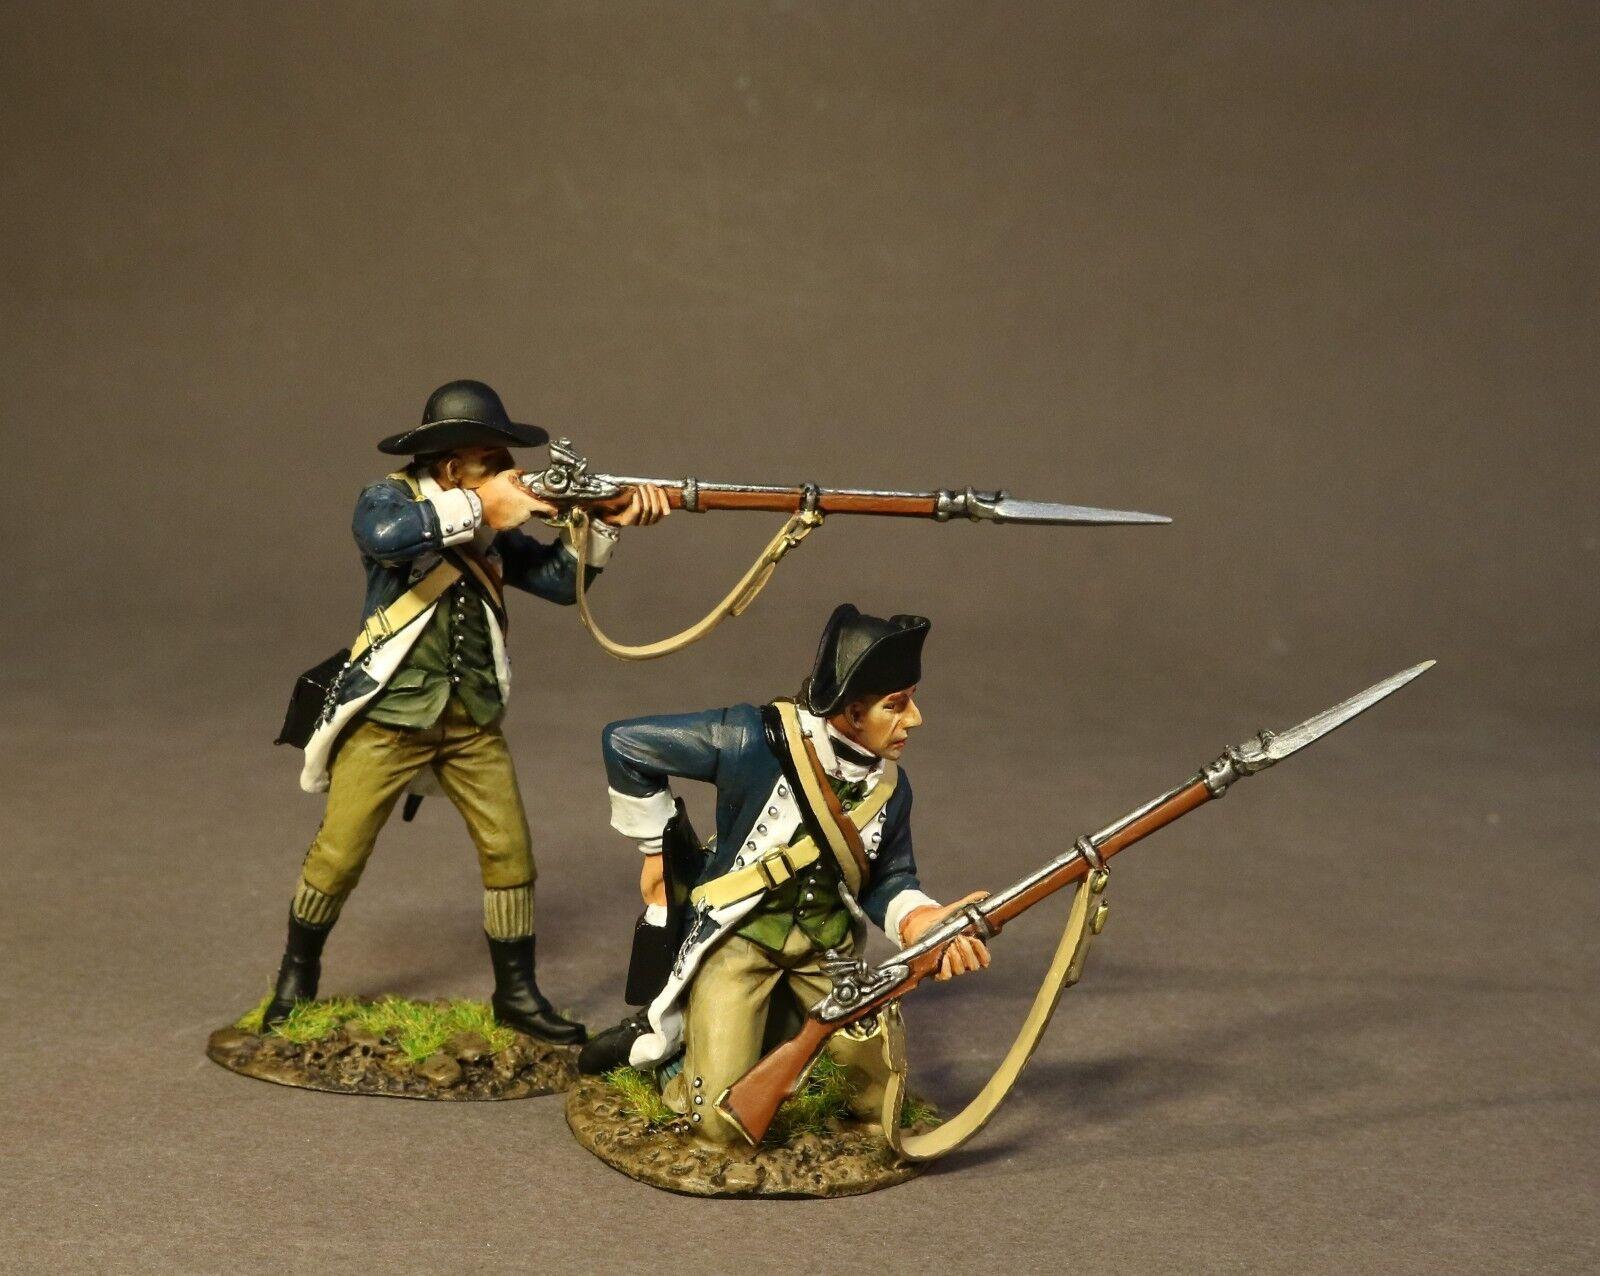 John Jenkins Trommeln entlang der Mohawk SMASS-06 2nd Masse Regiment Skirmishing